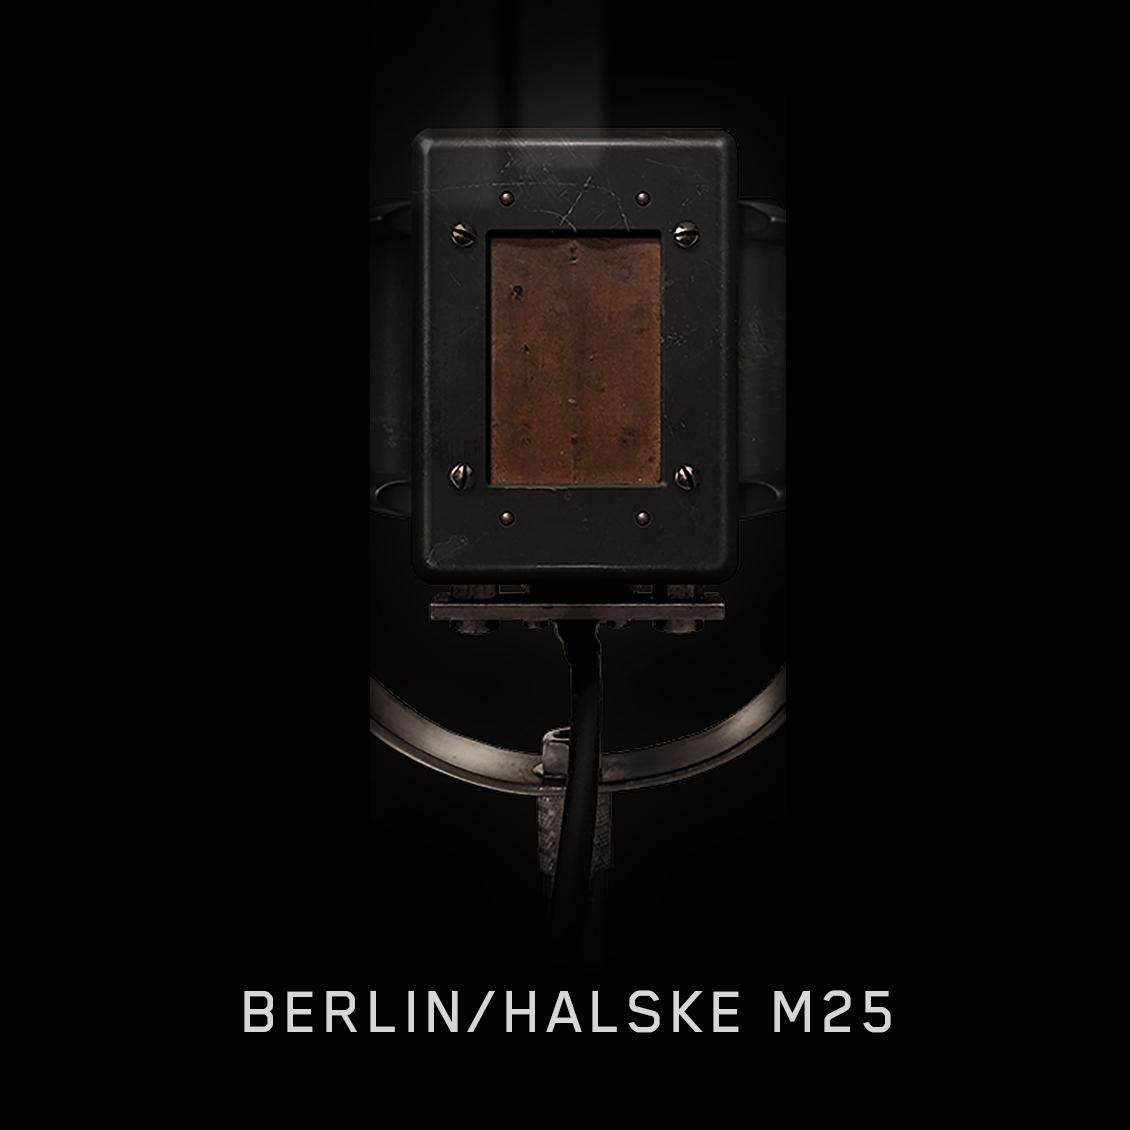 BerlinHalske M25